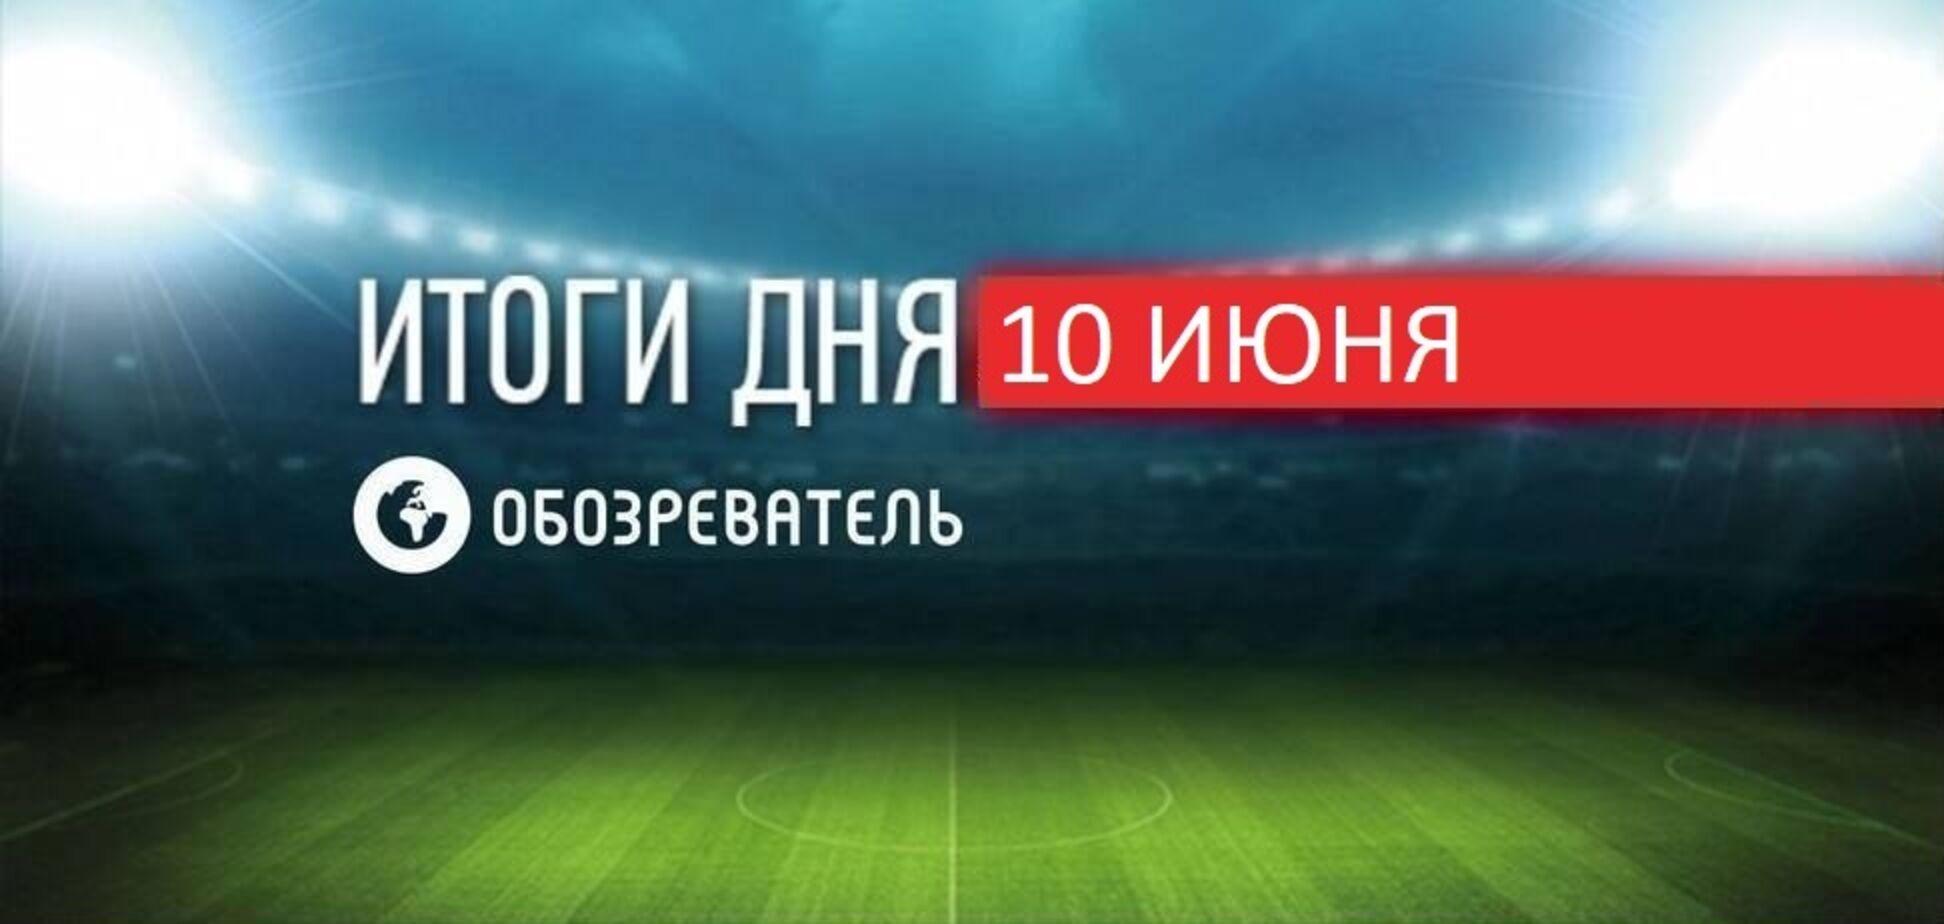 УЕФА запретил 'Героям слава!' на Евро-2020, спровоцировав гнев украинцев: новости спорта 10 июня